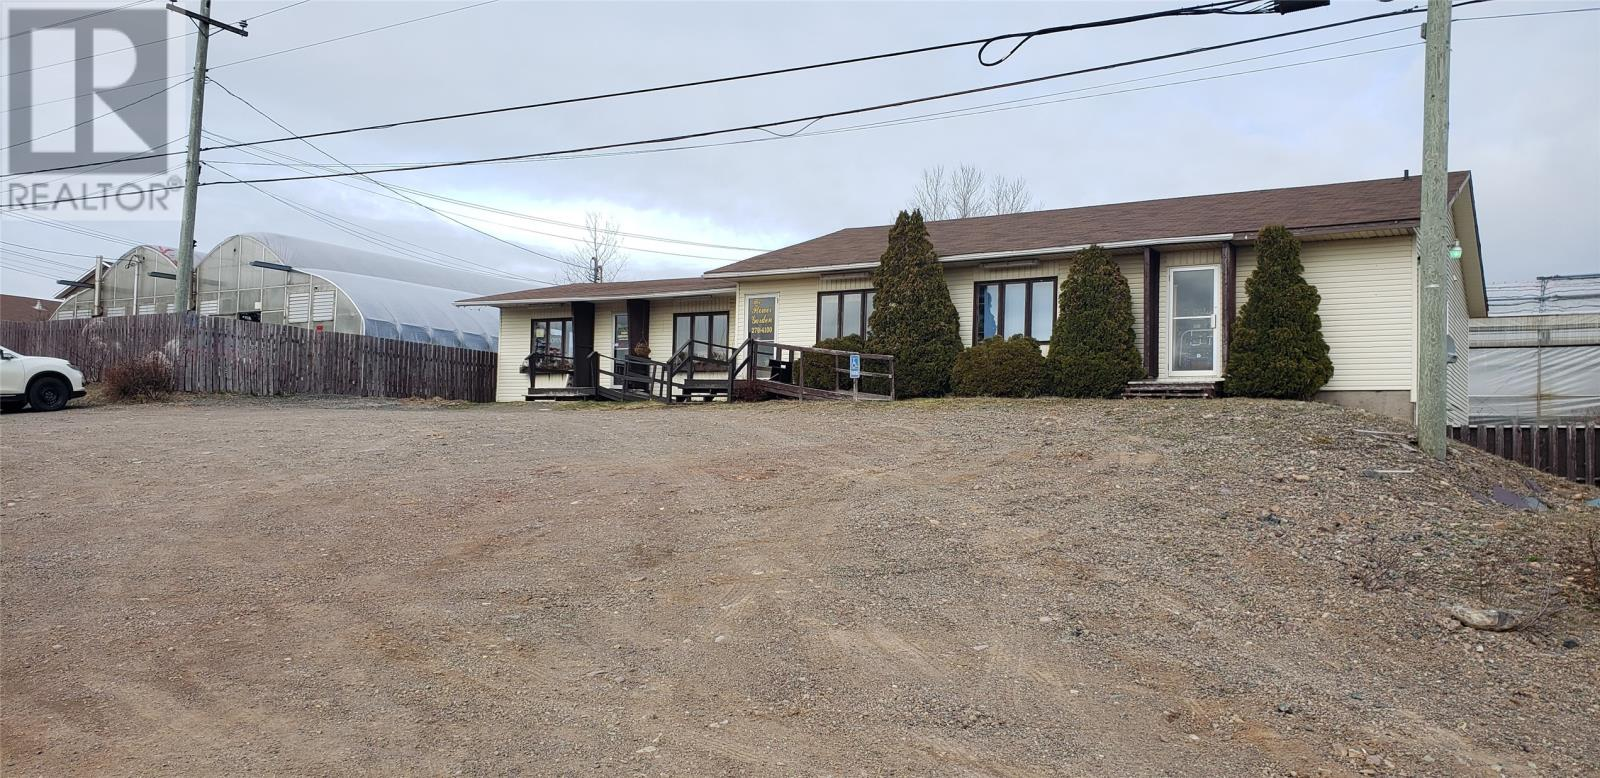 669 Creston Boulevard, Marystown, Newfoundland & Labrador  A0E 2M0 - Photo 3 - 1229607